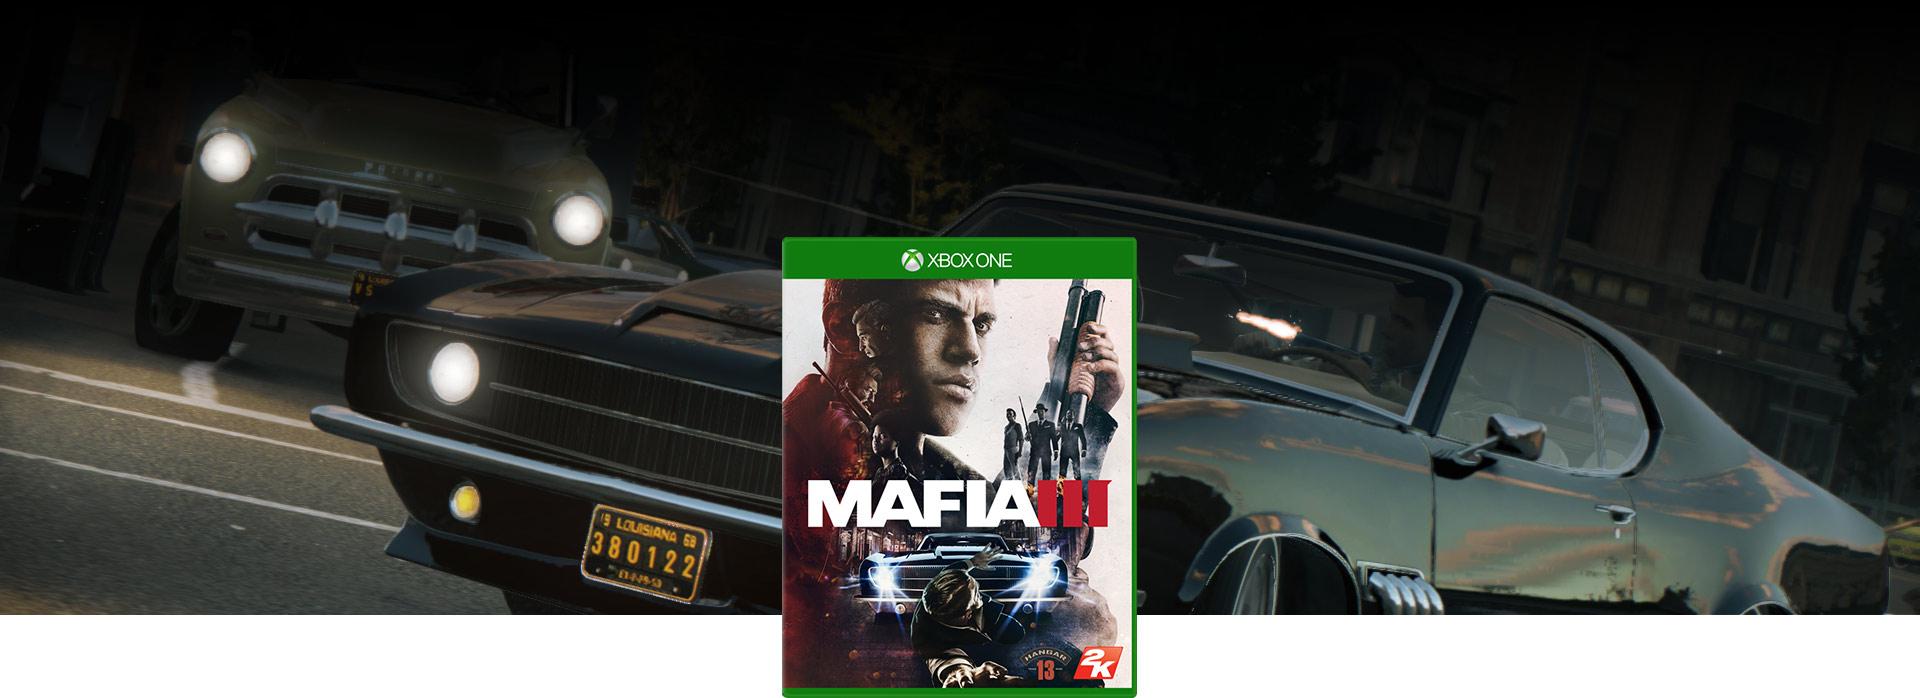 Mafia III box shot